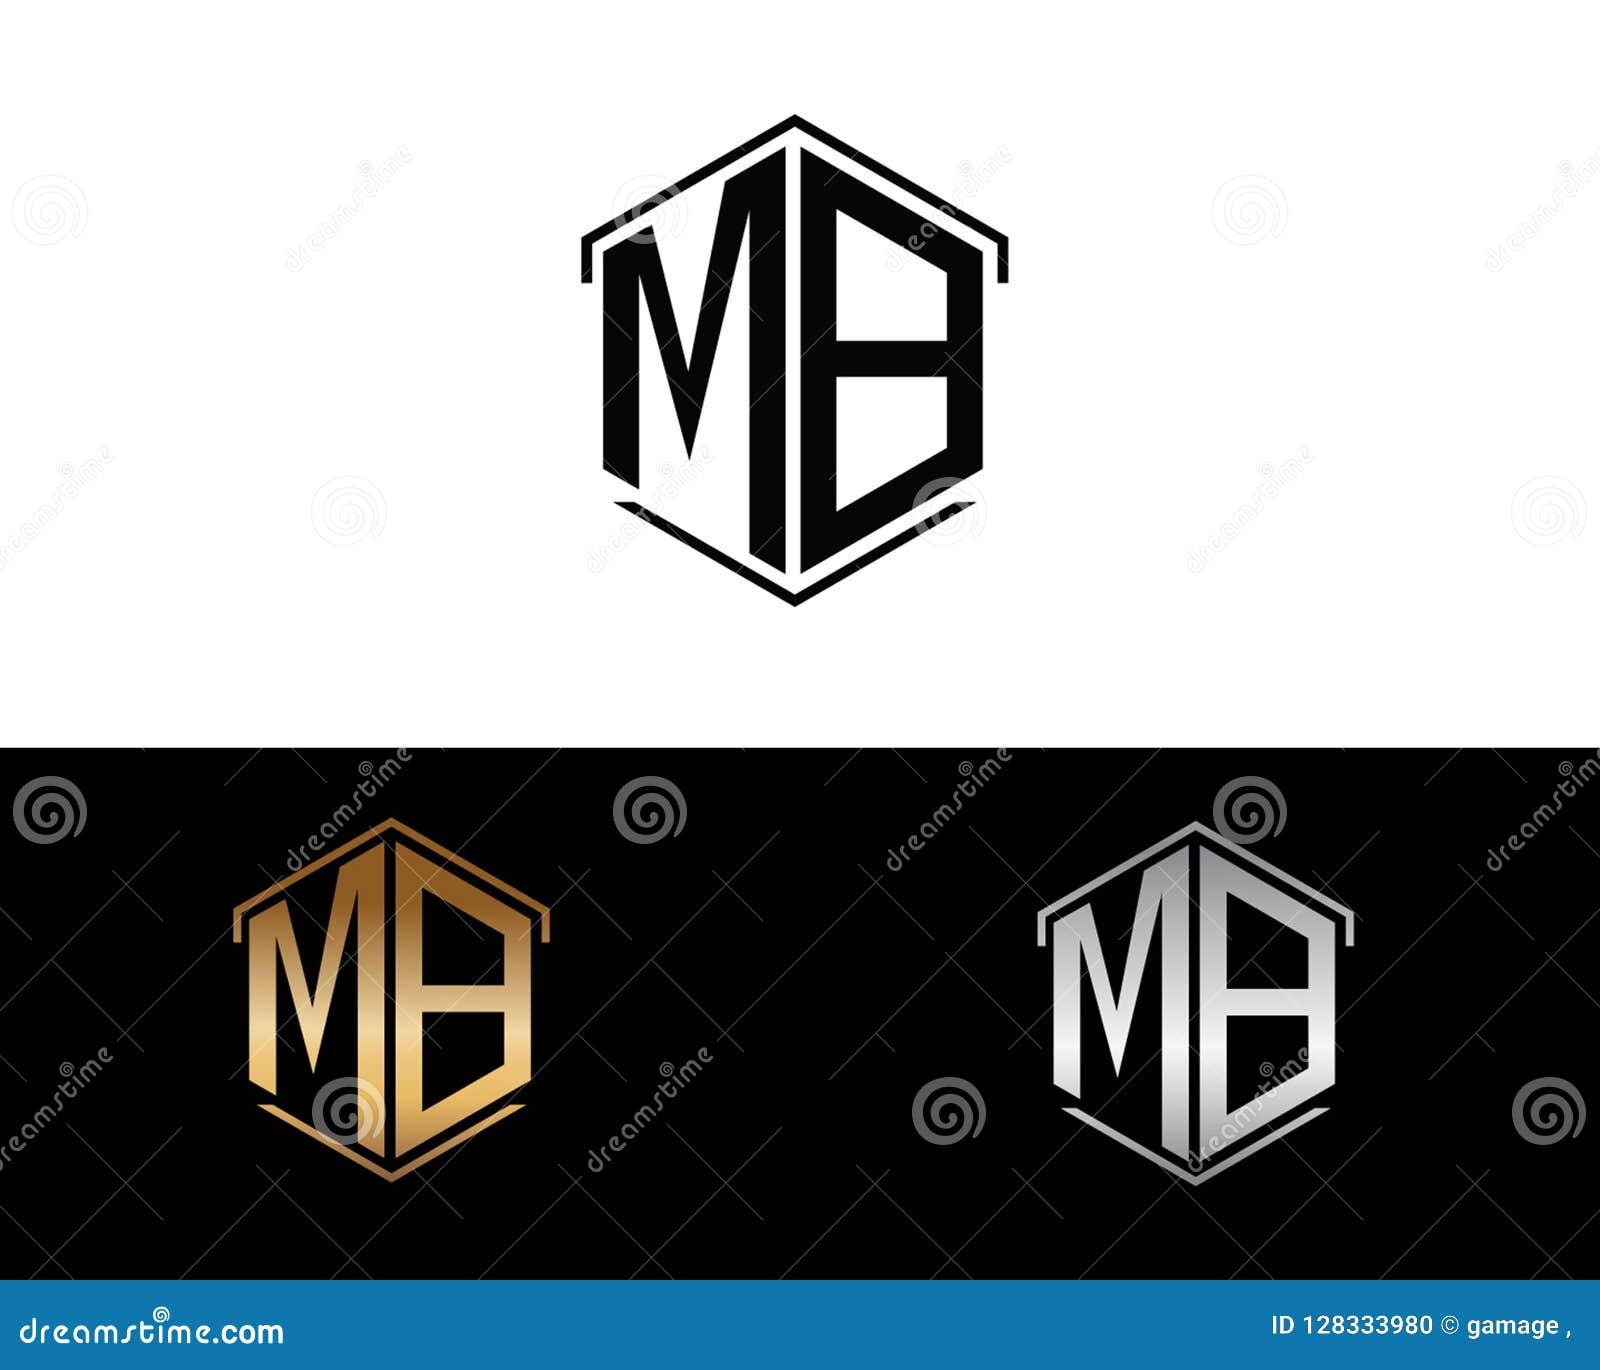 Mb-Hexagonformbuchstabe-Vektordesign